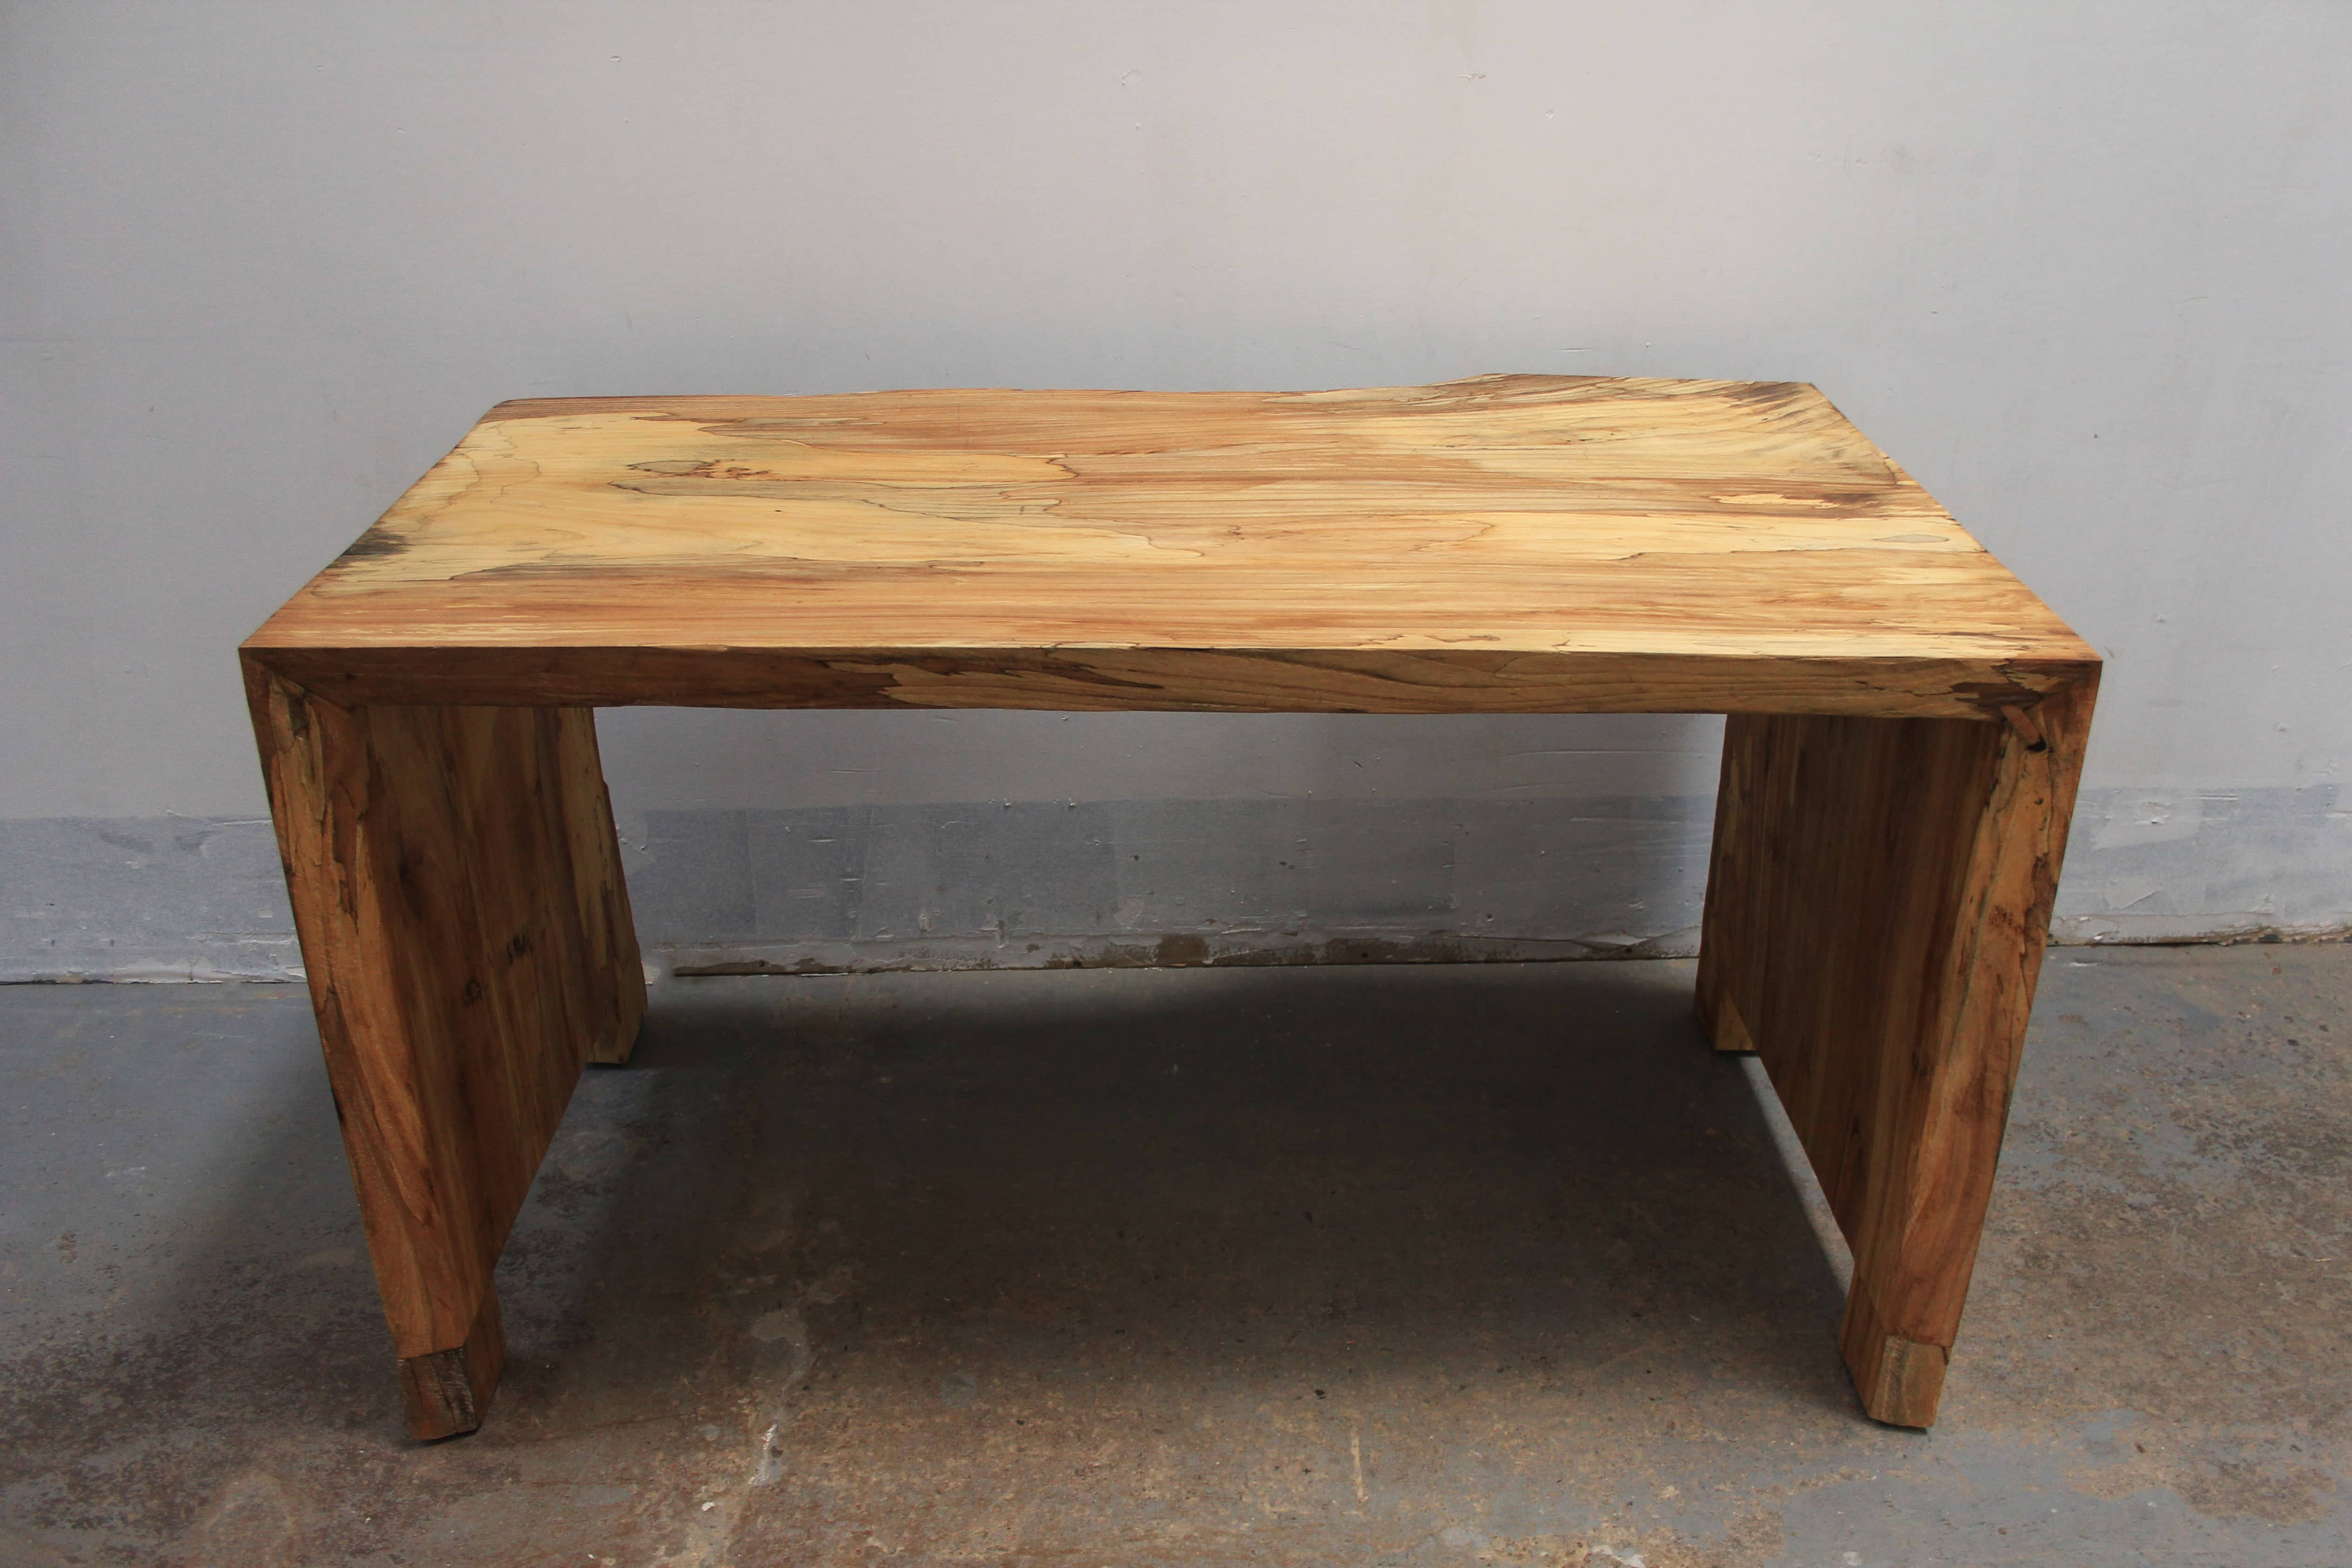 Michelle Sengara's Desk